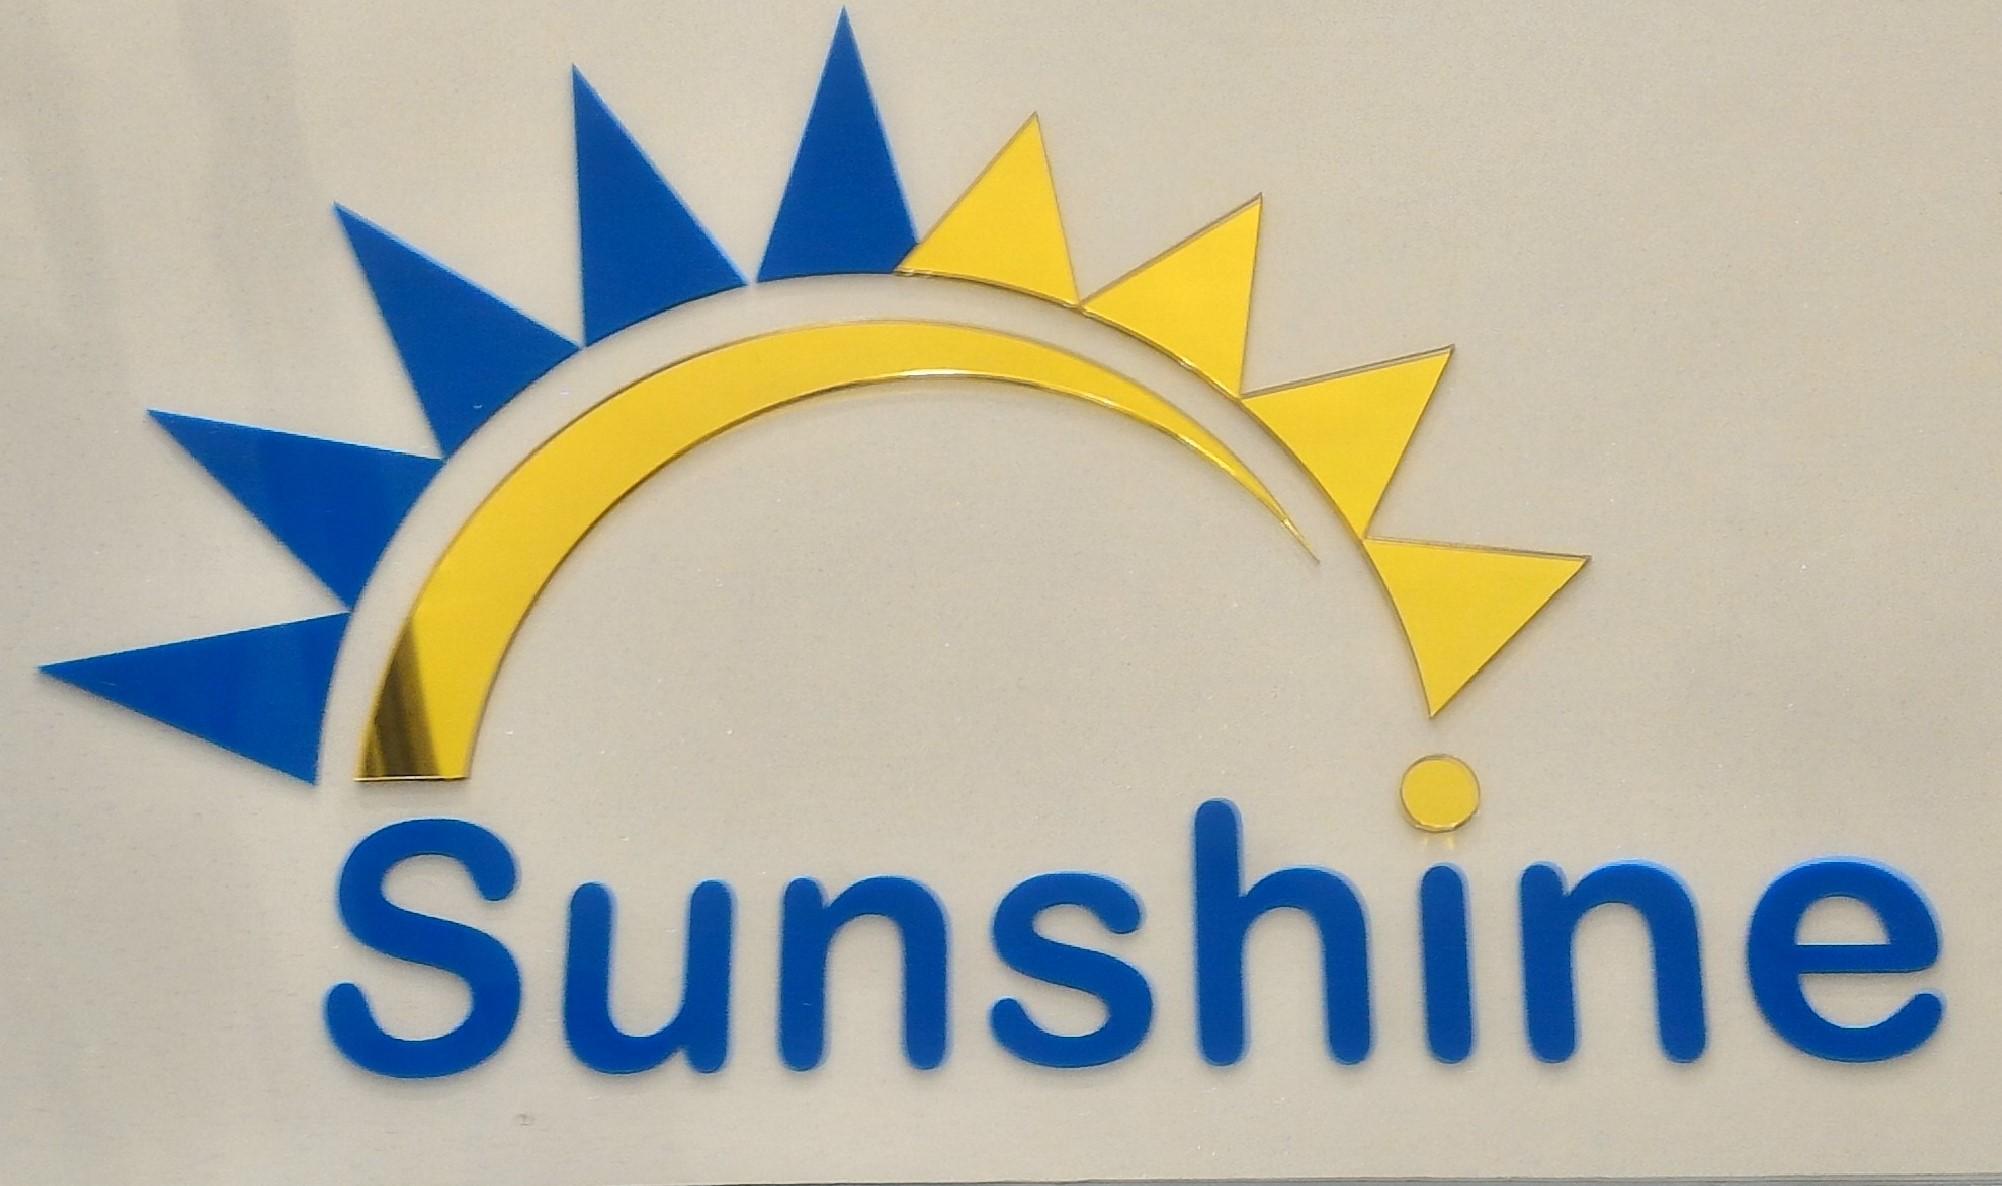 Sunshine Clinic for Pediatrics and Orthopedics